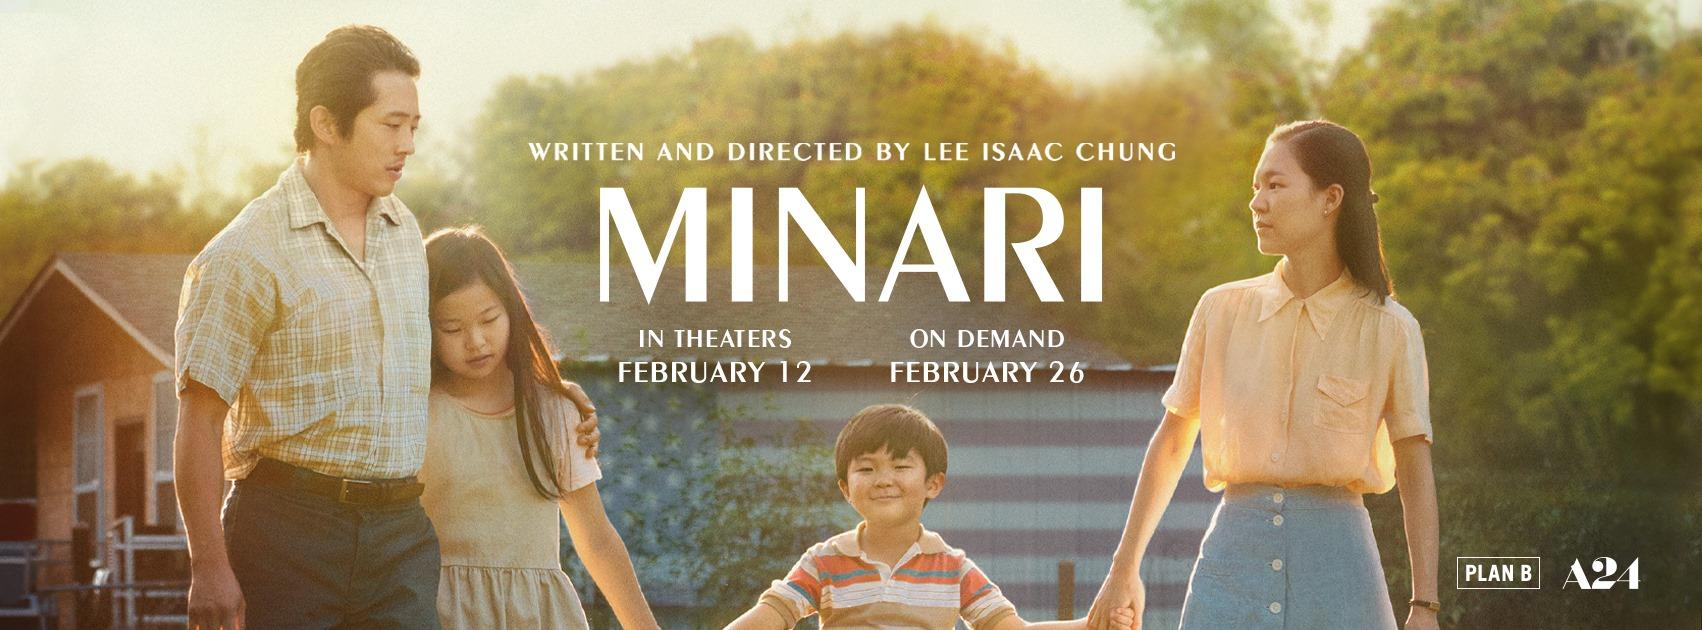 Minari, A24, Plan B Entertainment